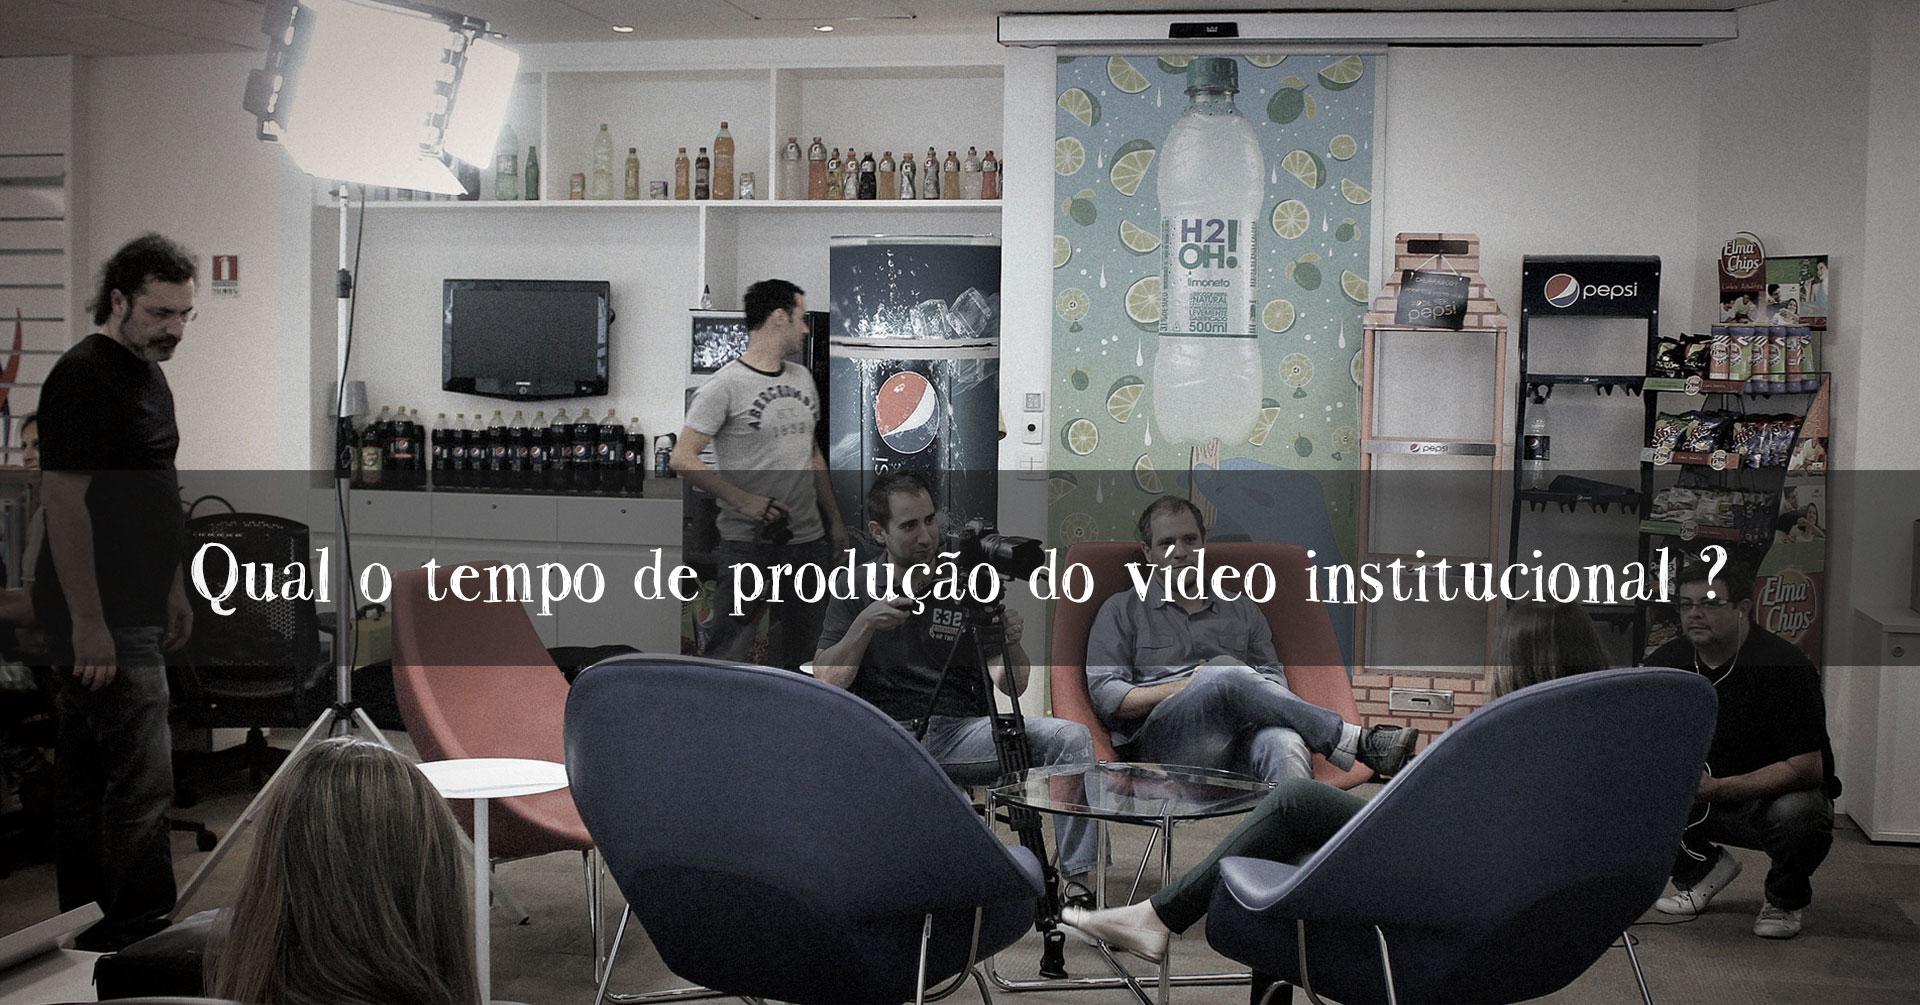 tempo vídeo isntitucional